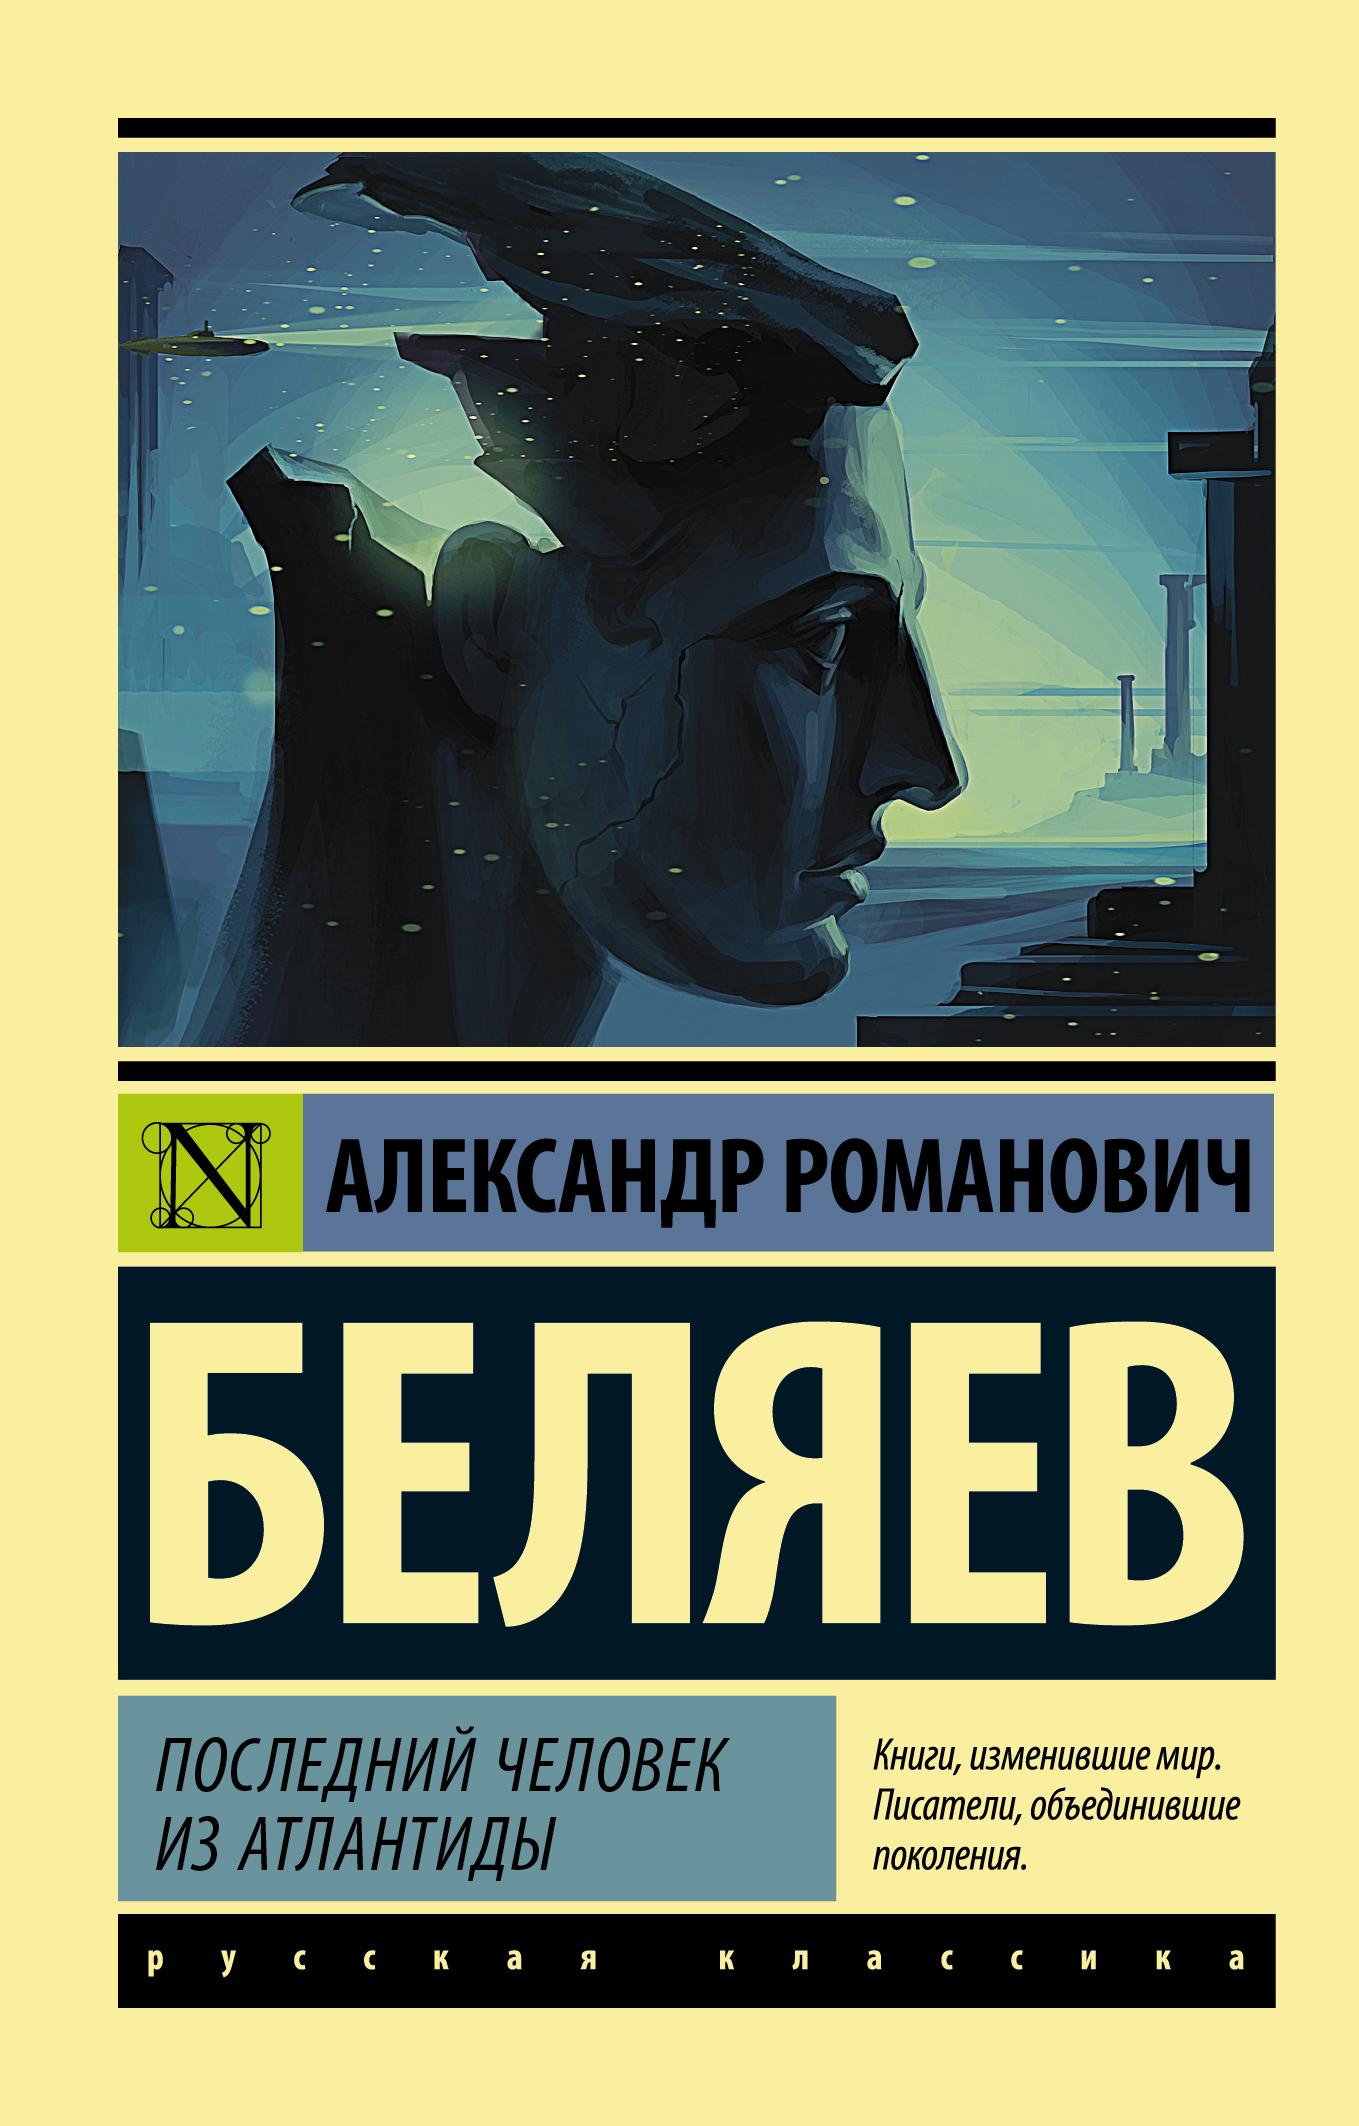 Беляев Александр Романович Последний человек из Атлантиды